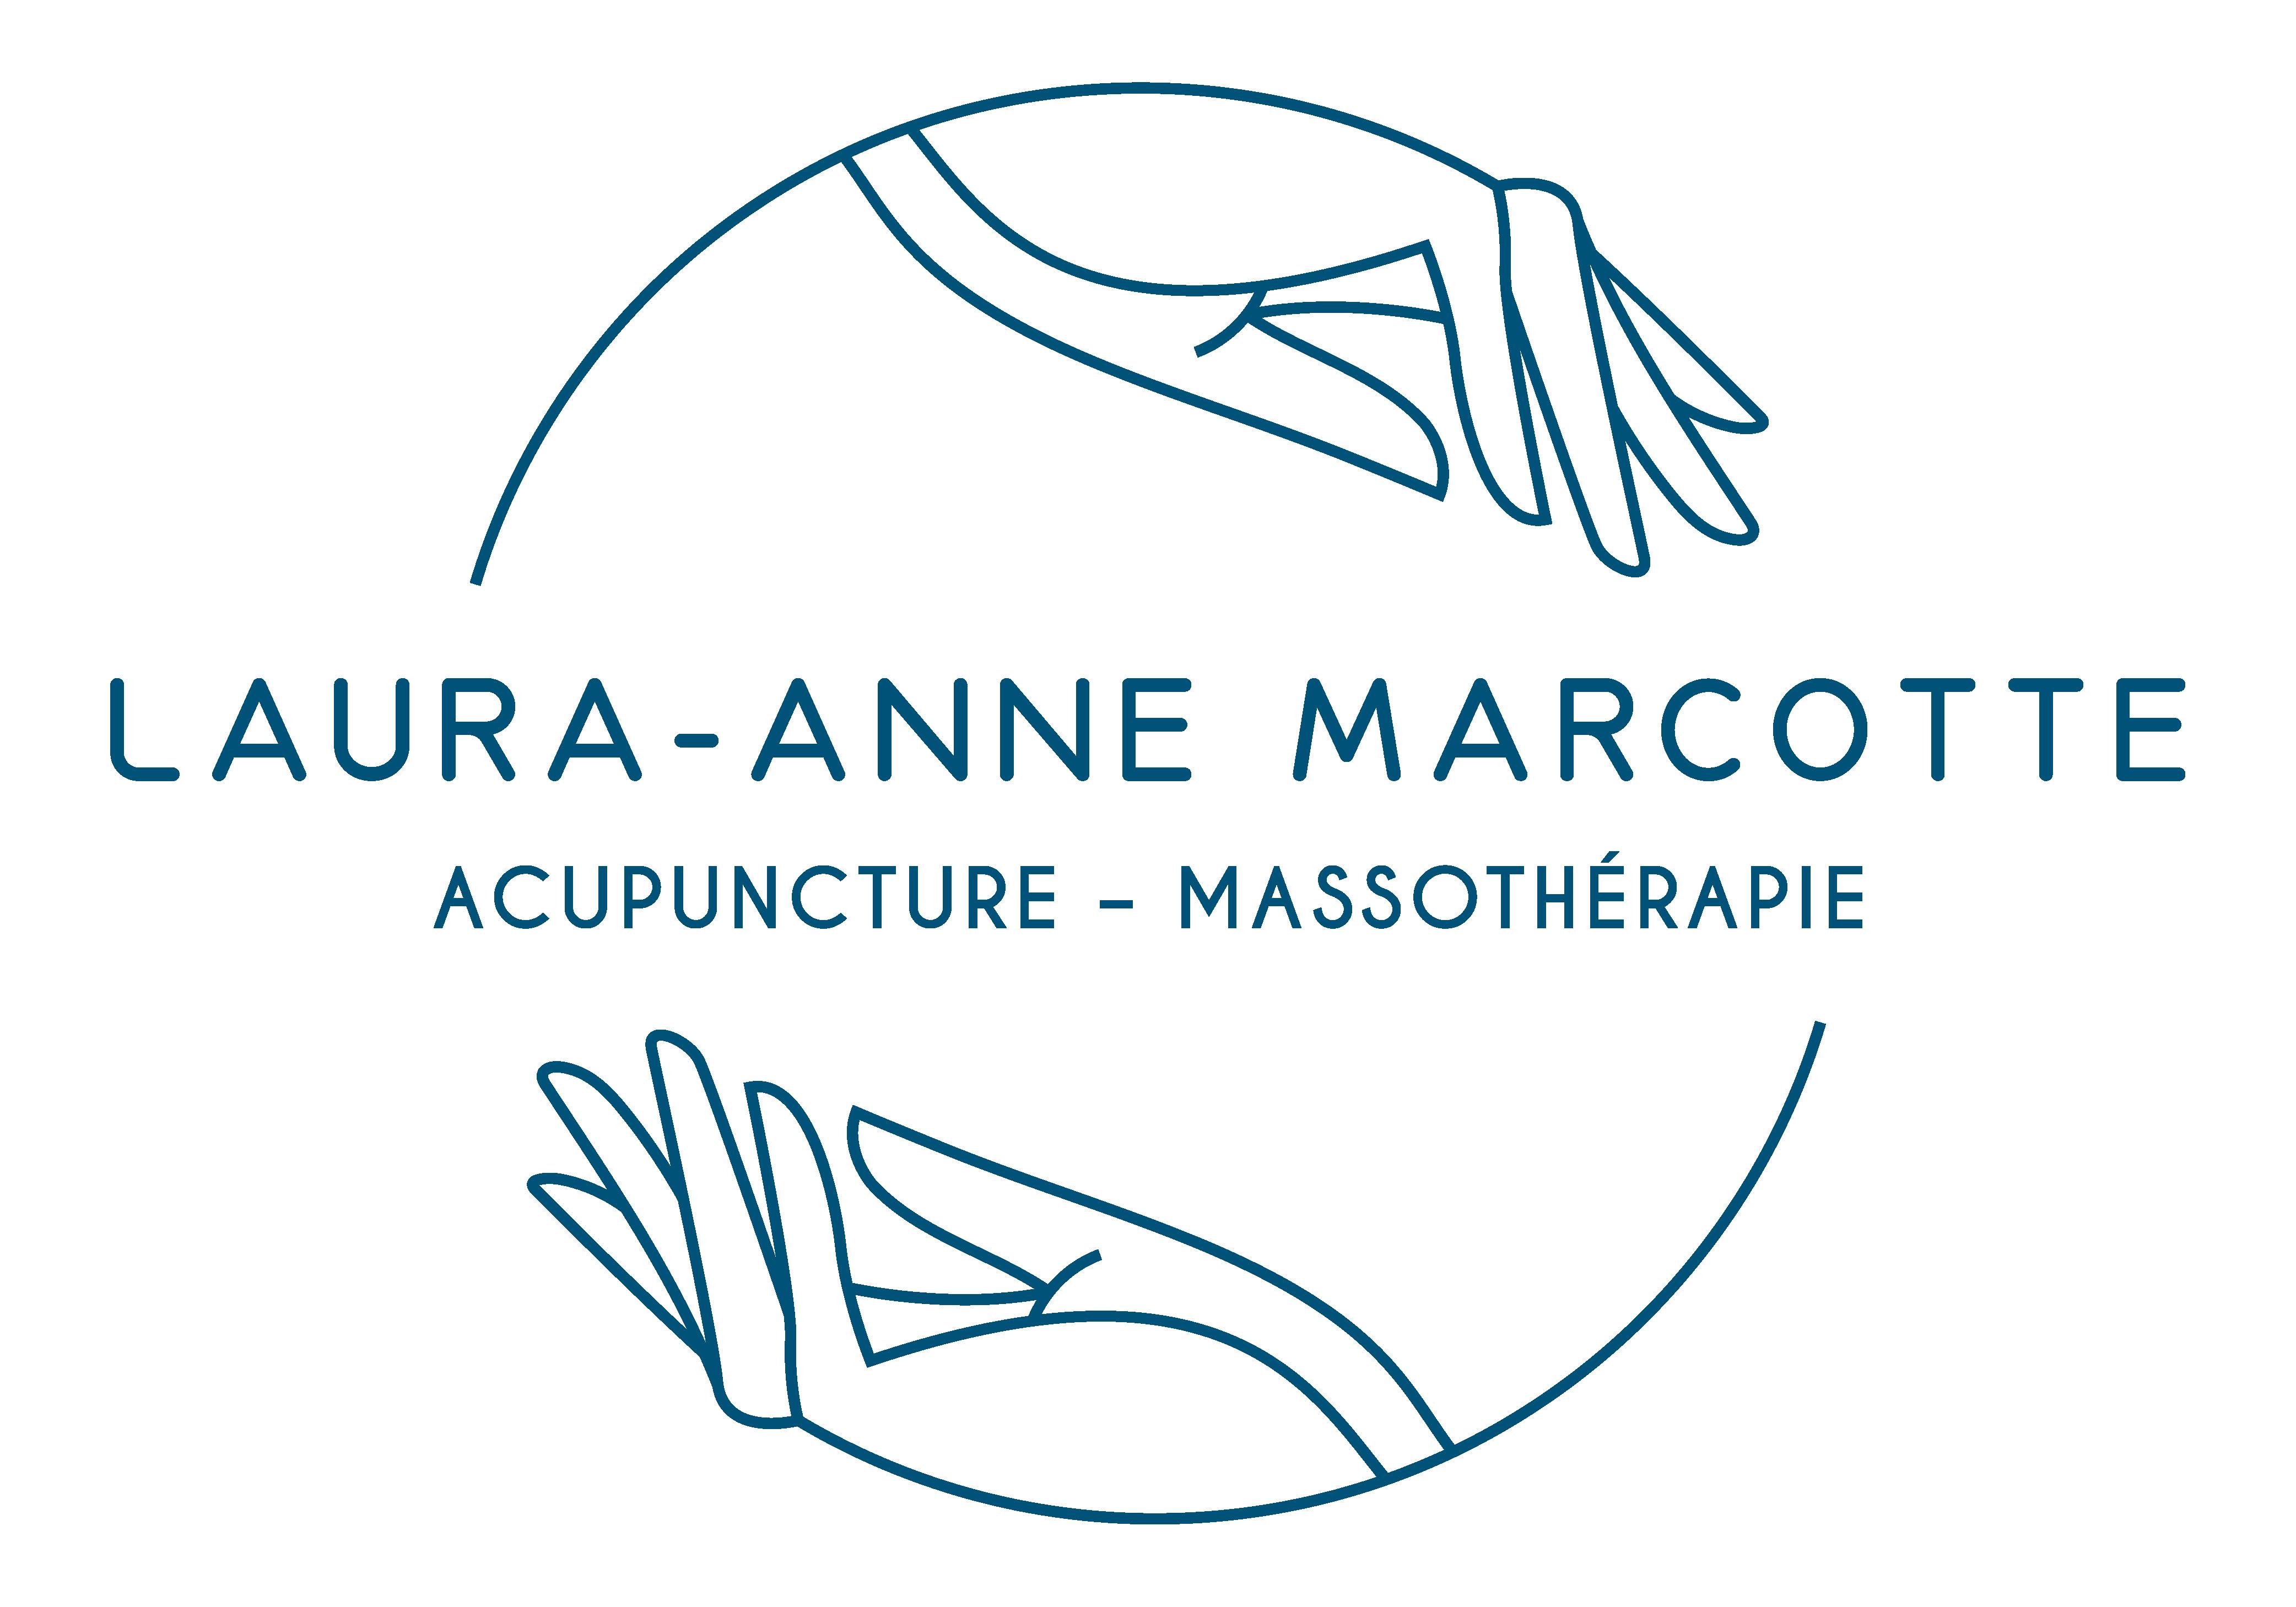 Laura-Anne Marcotte, Ac.